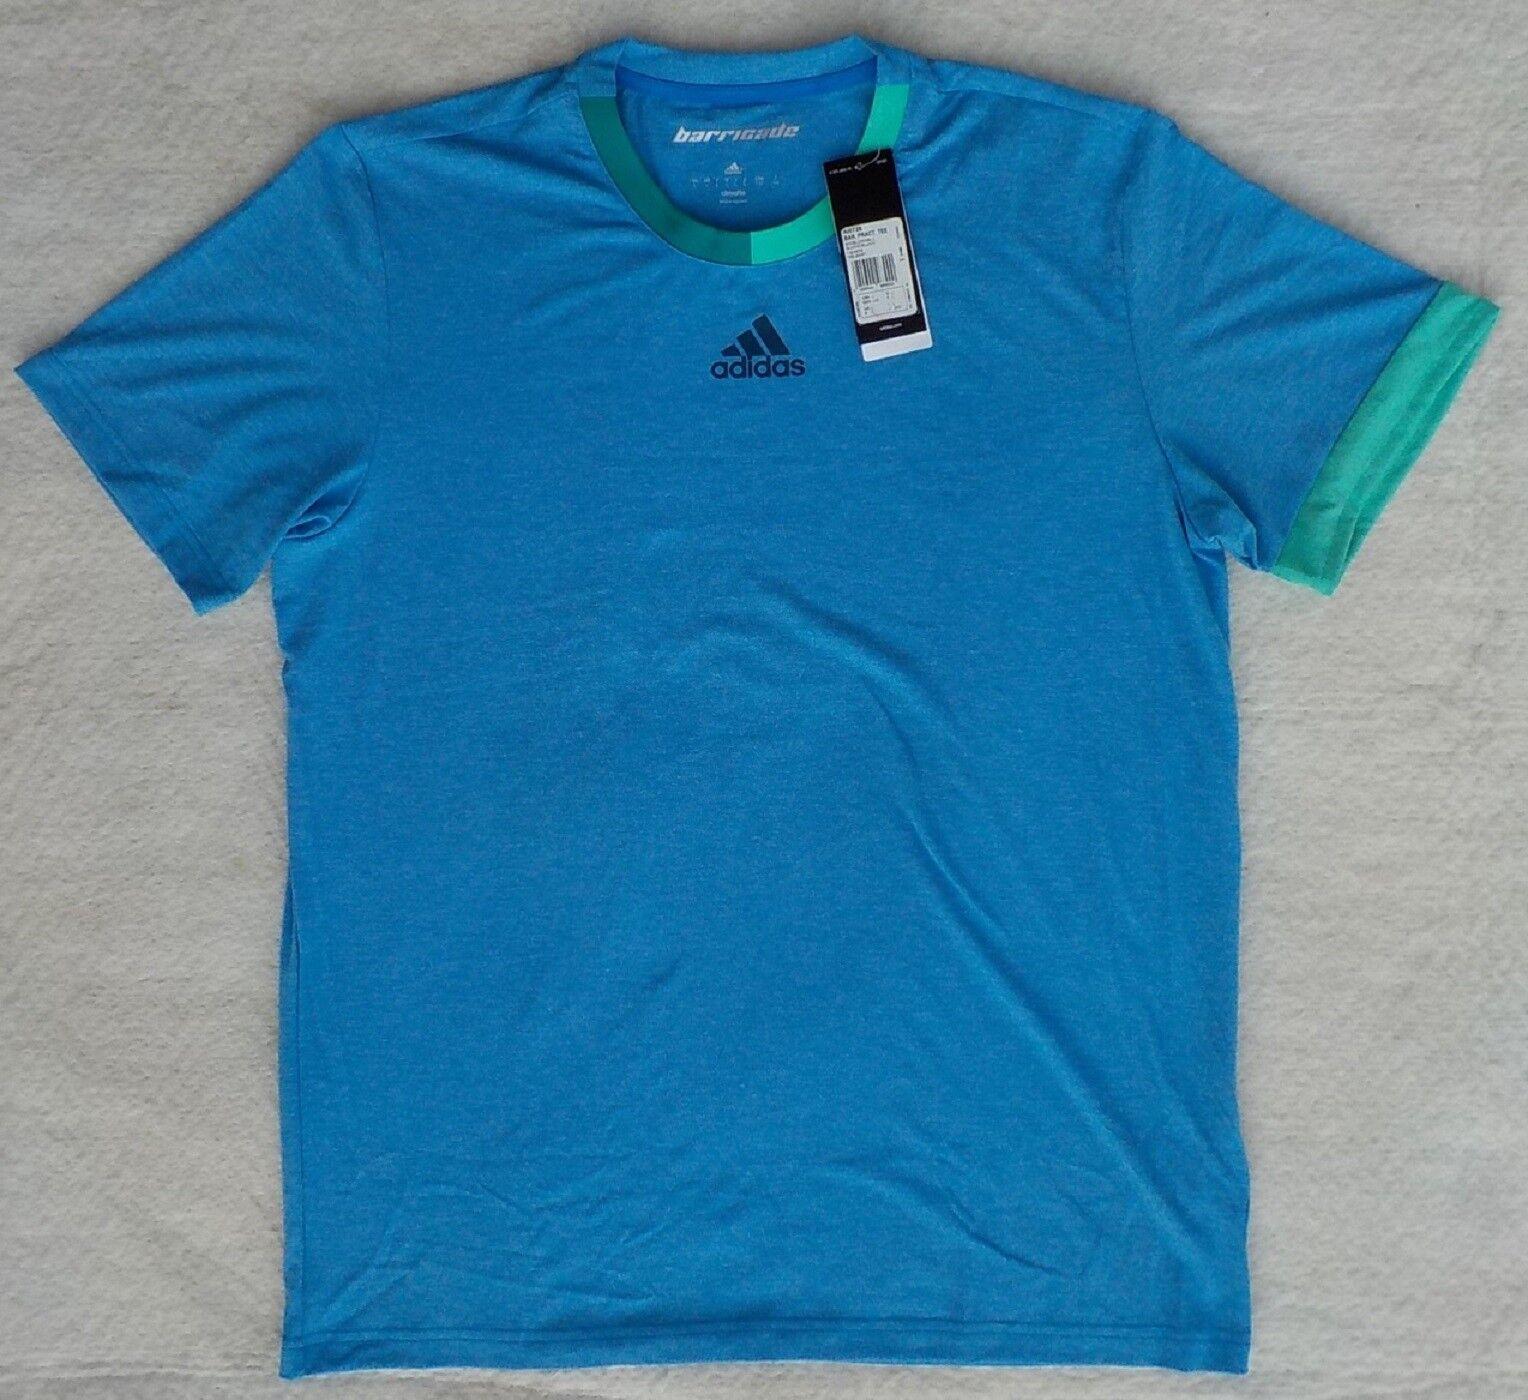 adidas barricade AI0726 Practice Herren Tennis T-Shirt S M L XL 2XL blau Tee